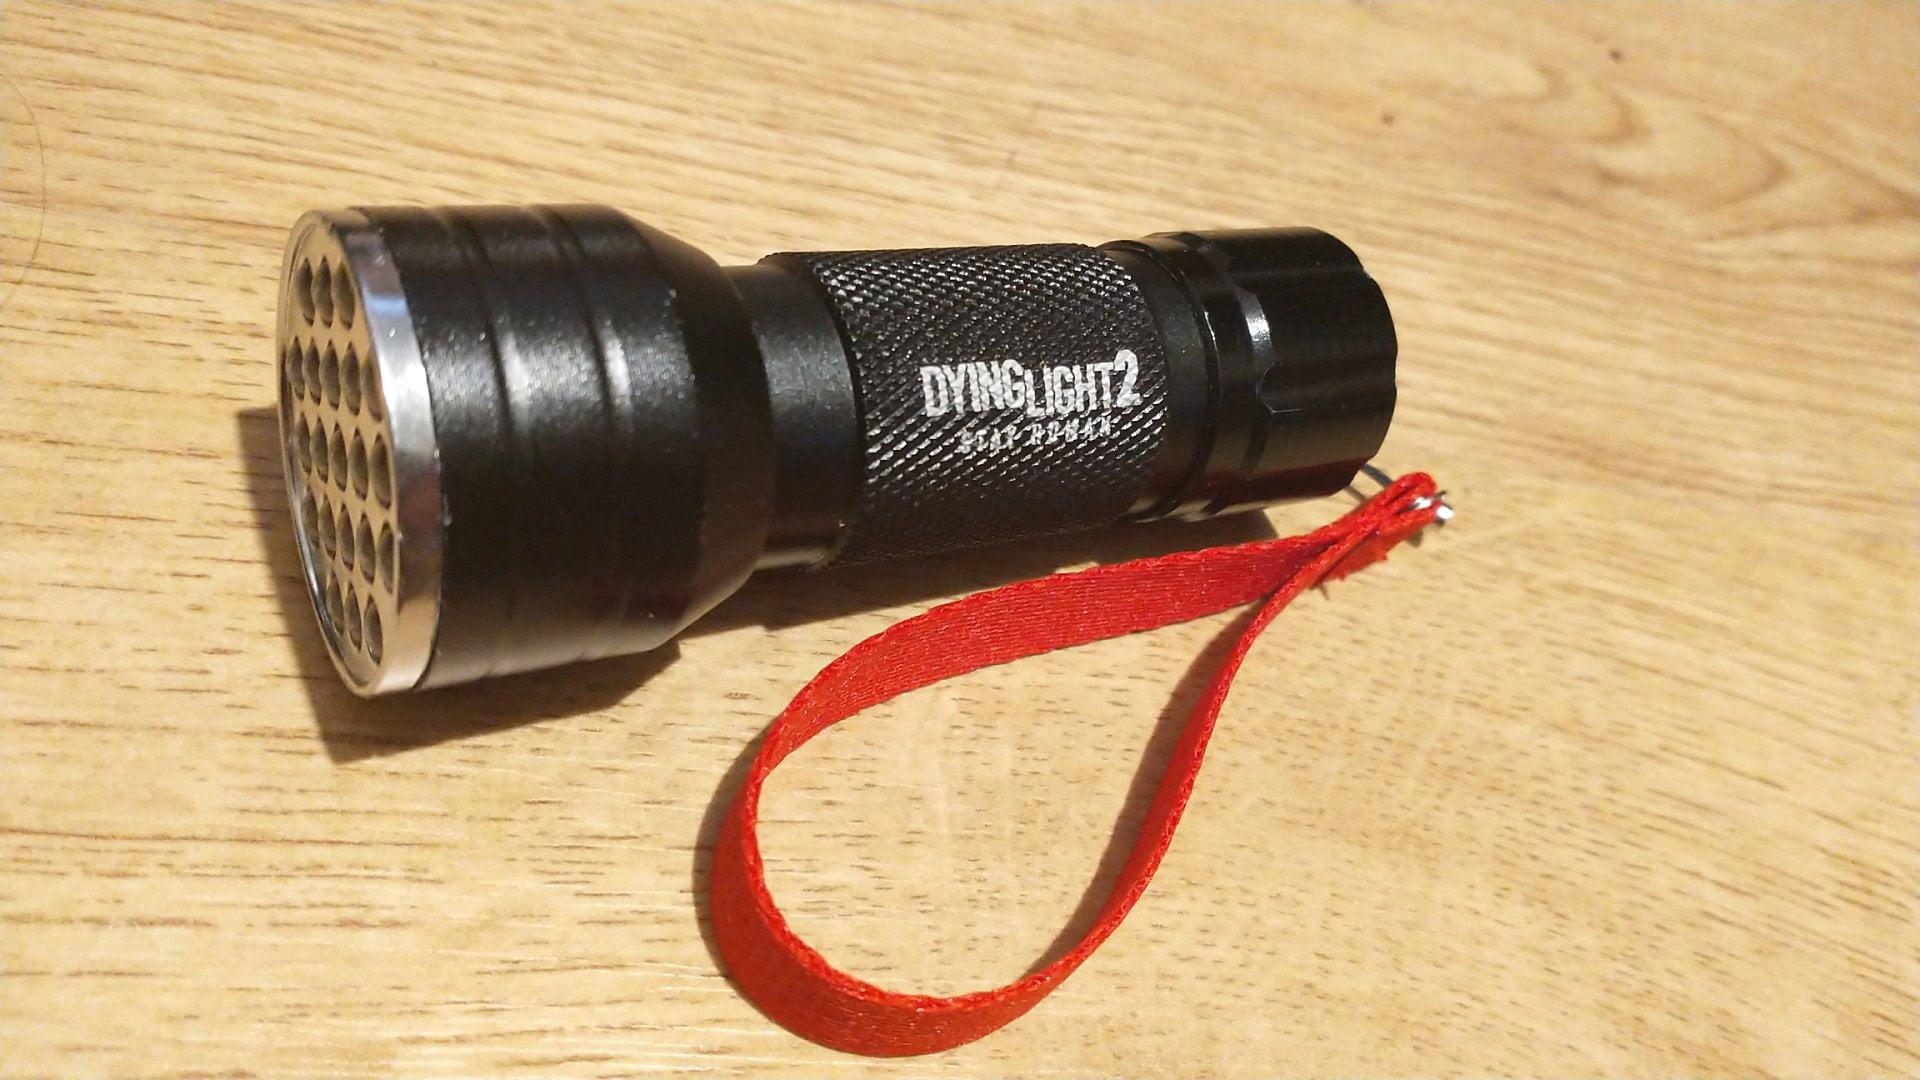 Dying Light 2 Press 4+1